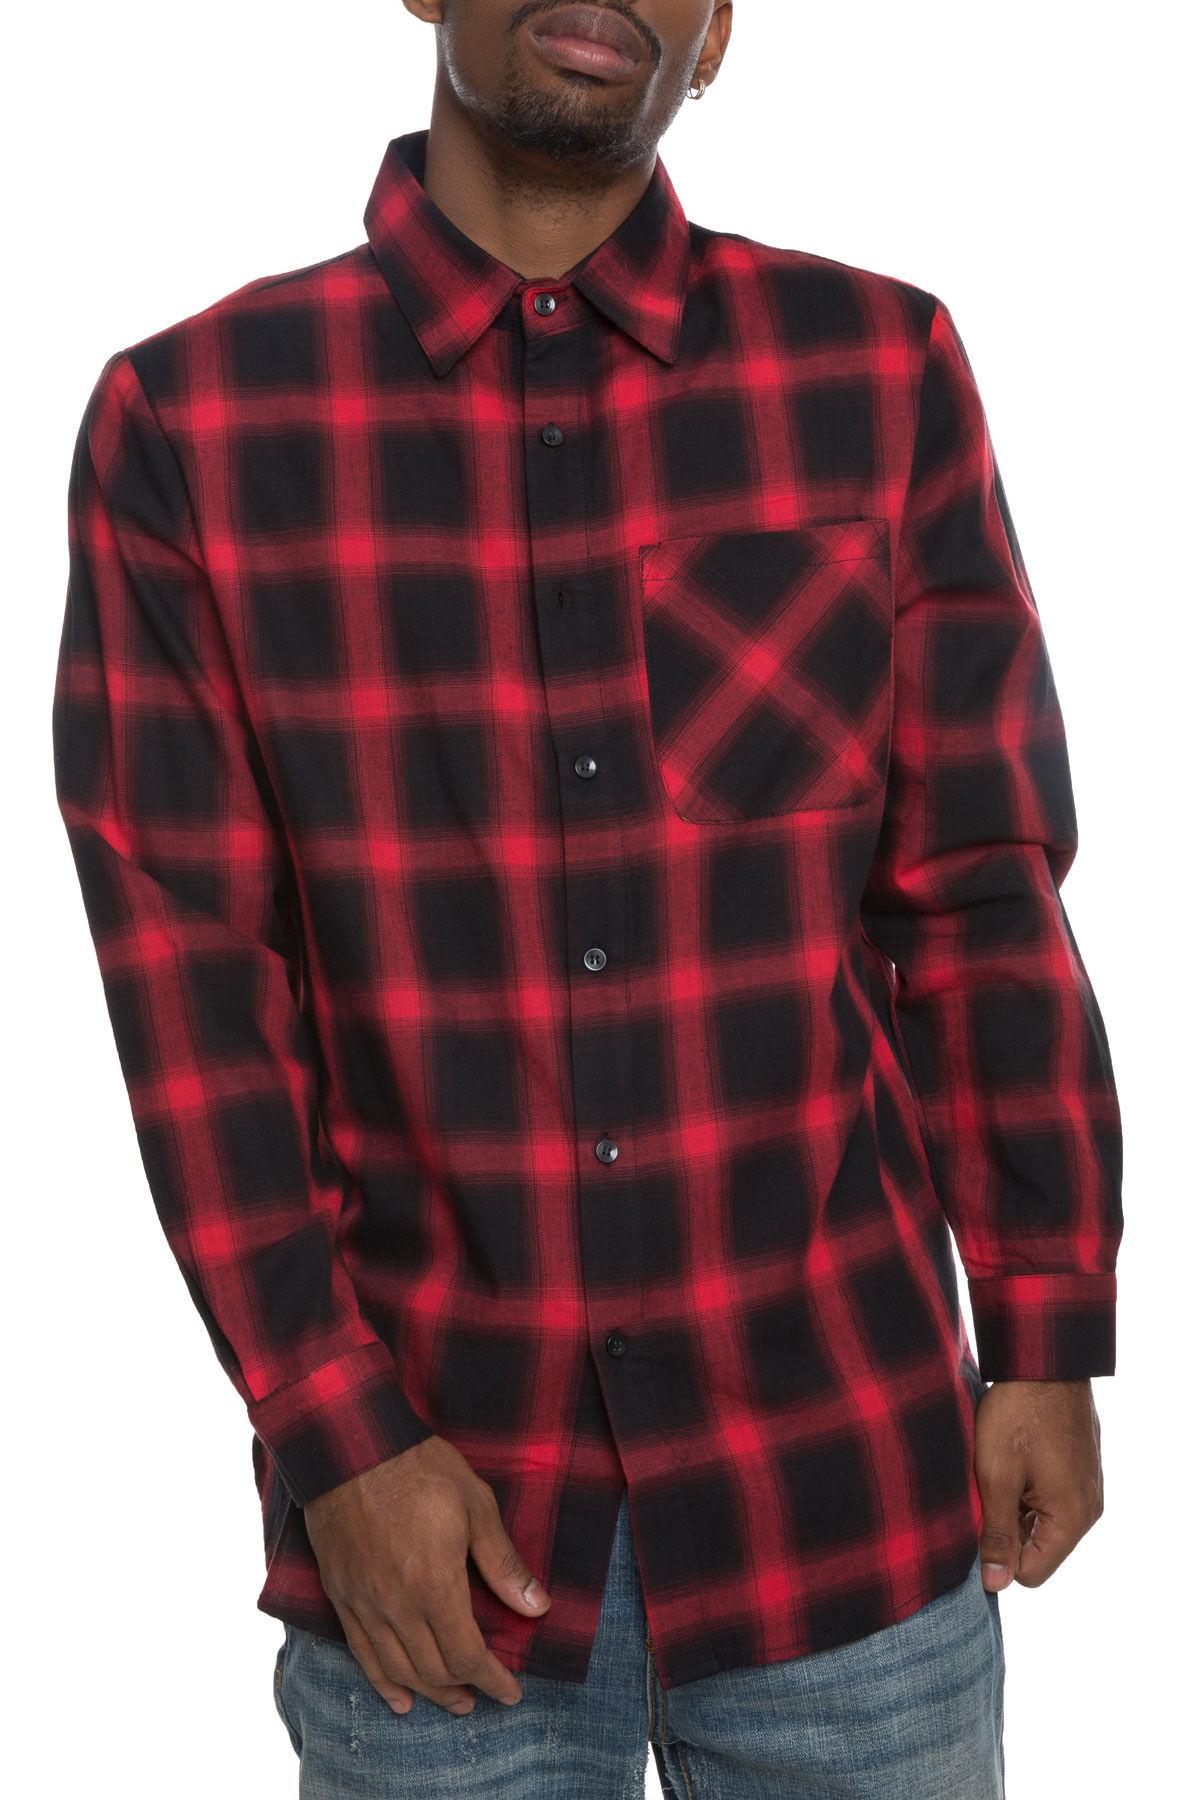 long plaid flannel red/black